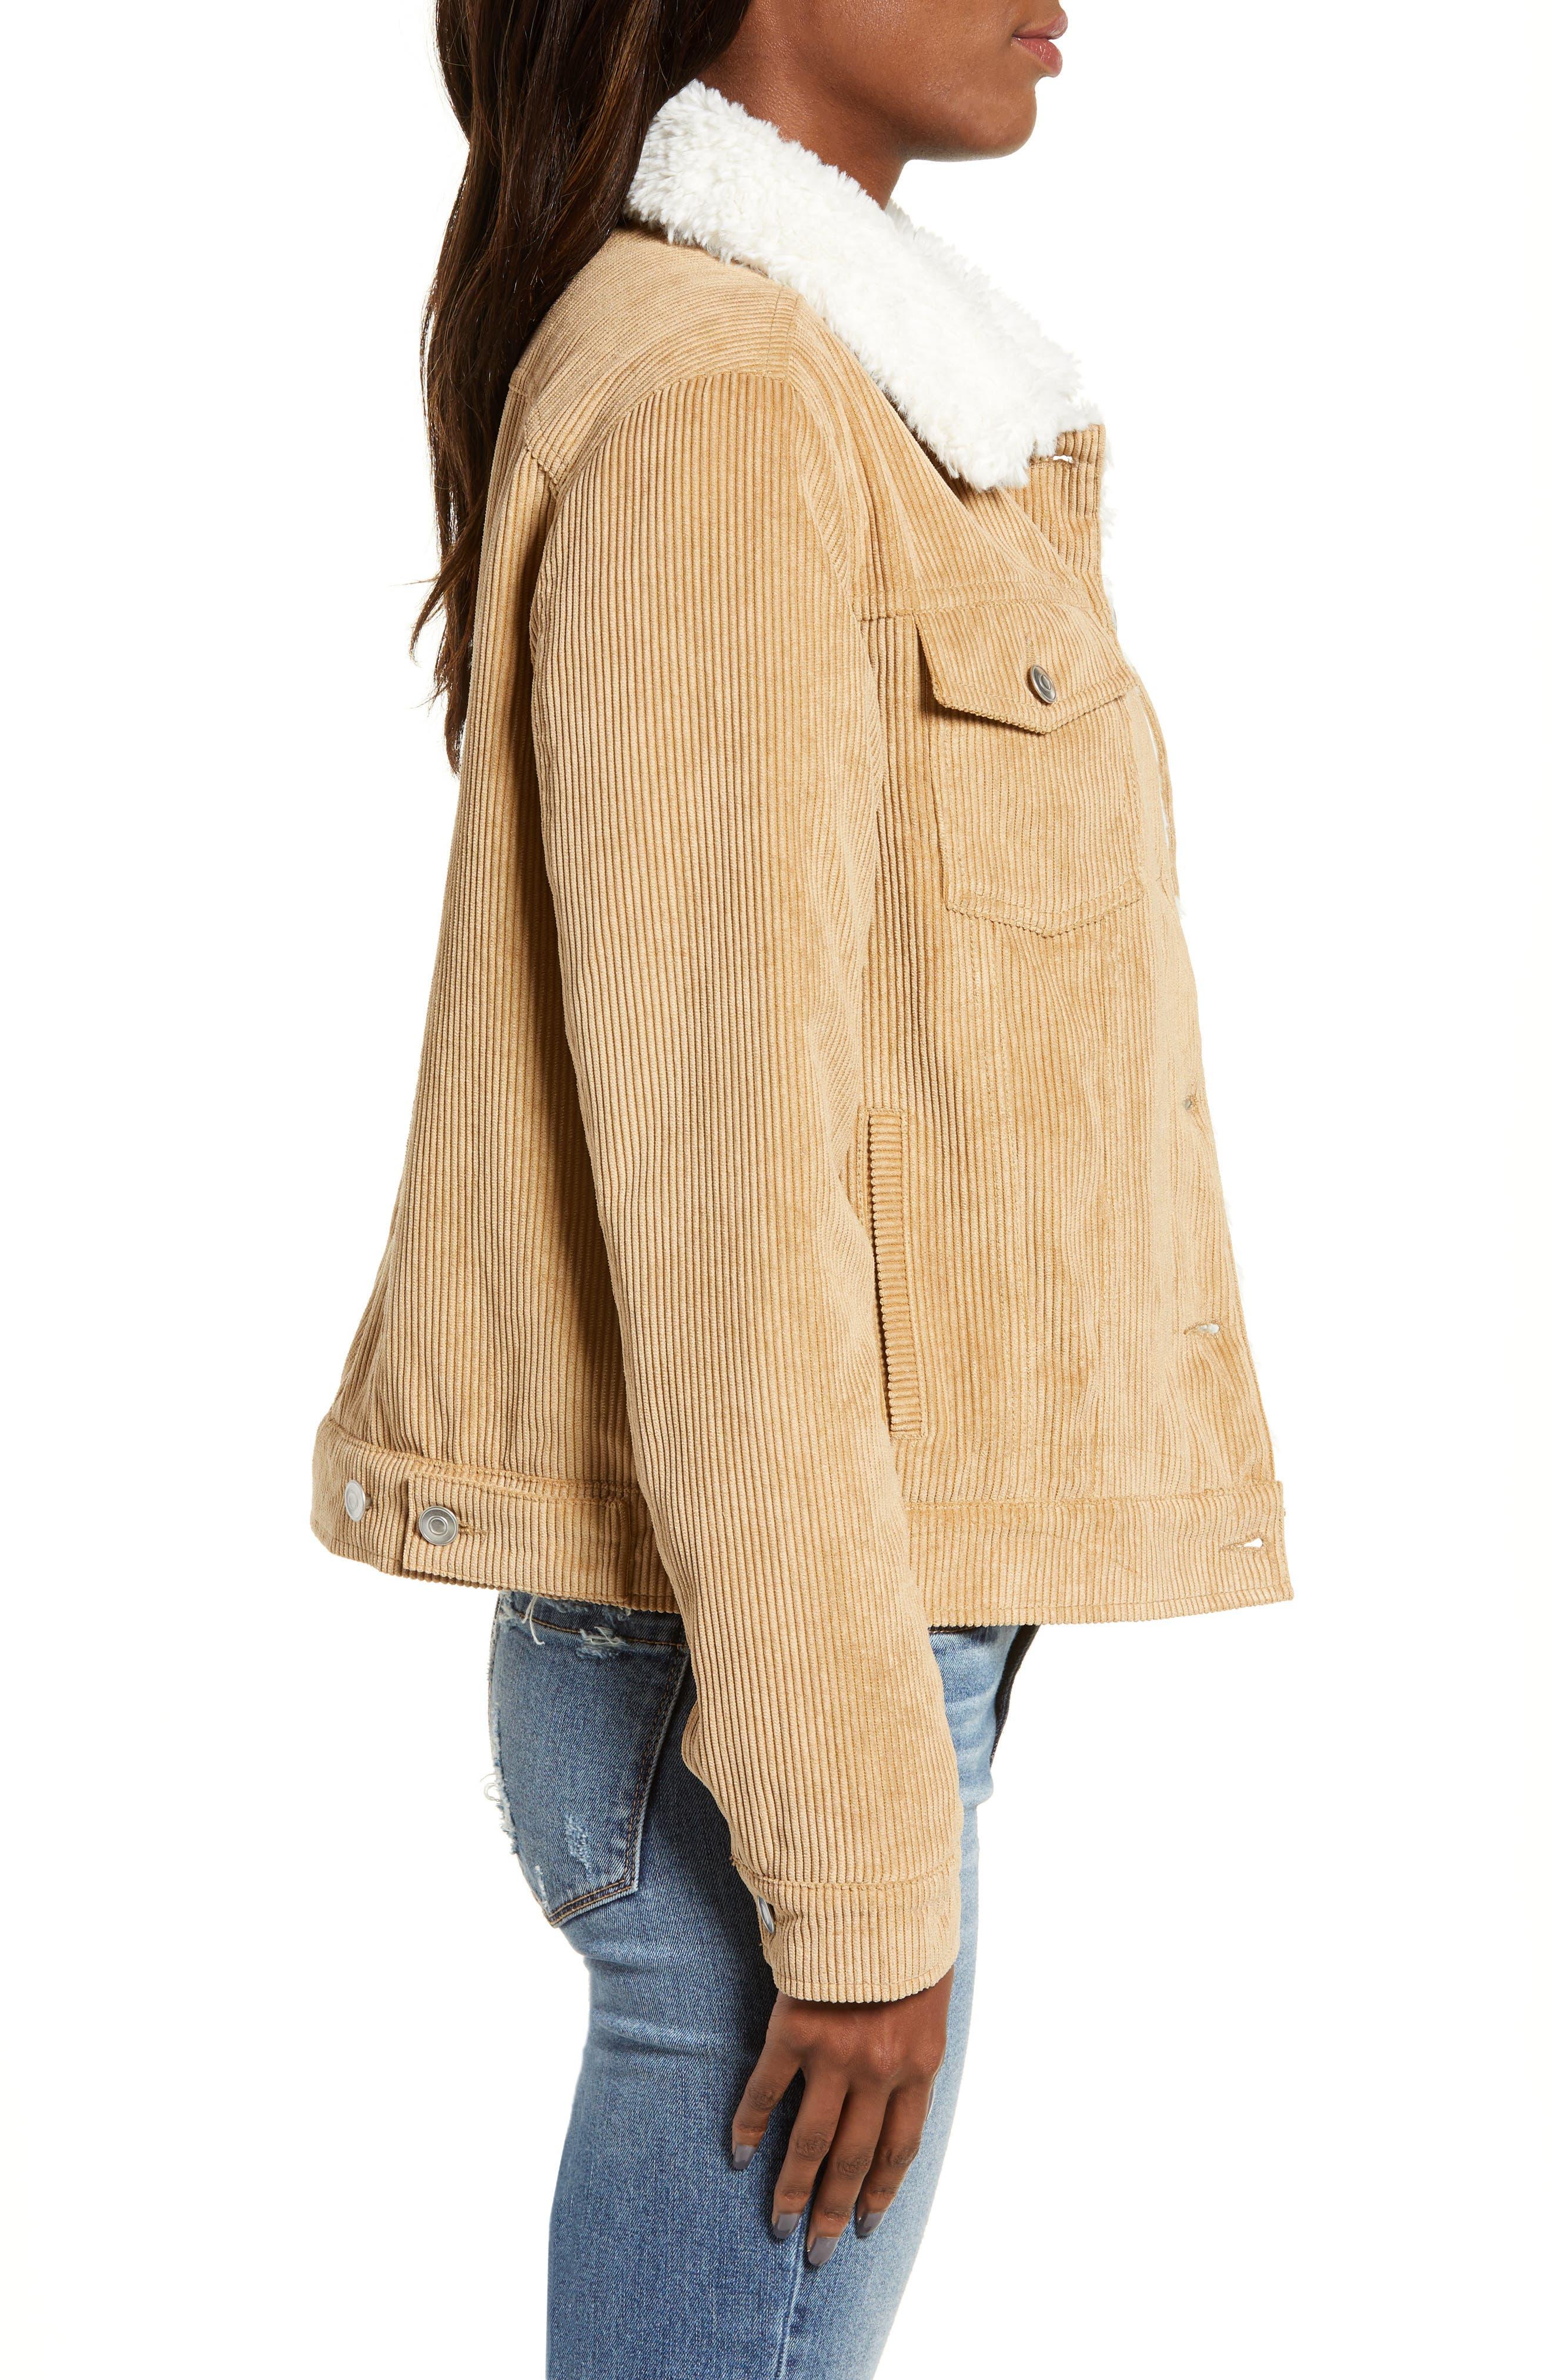 THREAD & SUPPLY, Paddington Fleece Lined Corduroy Jacket, Alternate thumbnail 4, color, KHAKI